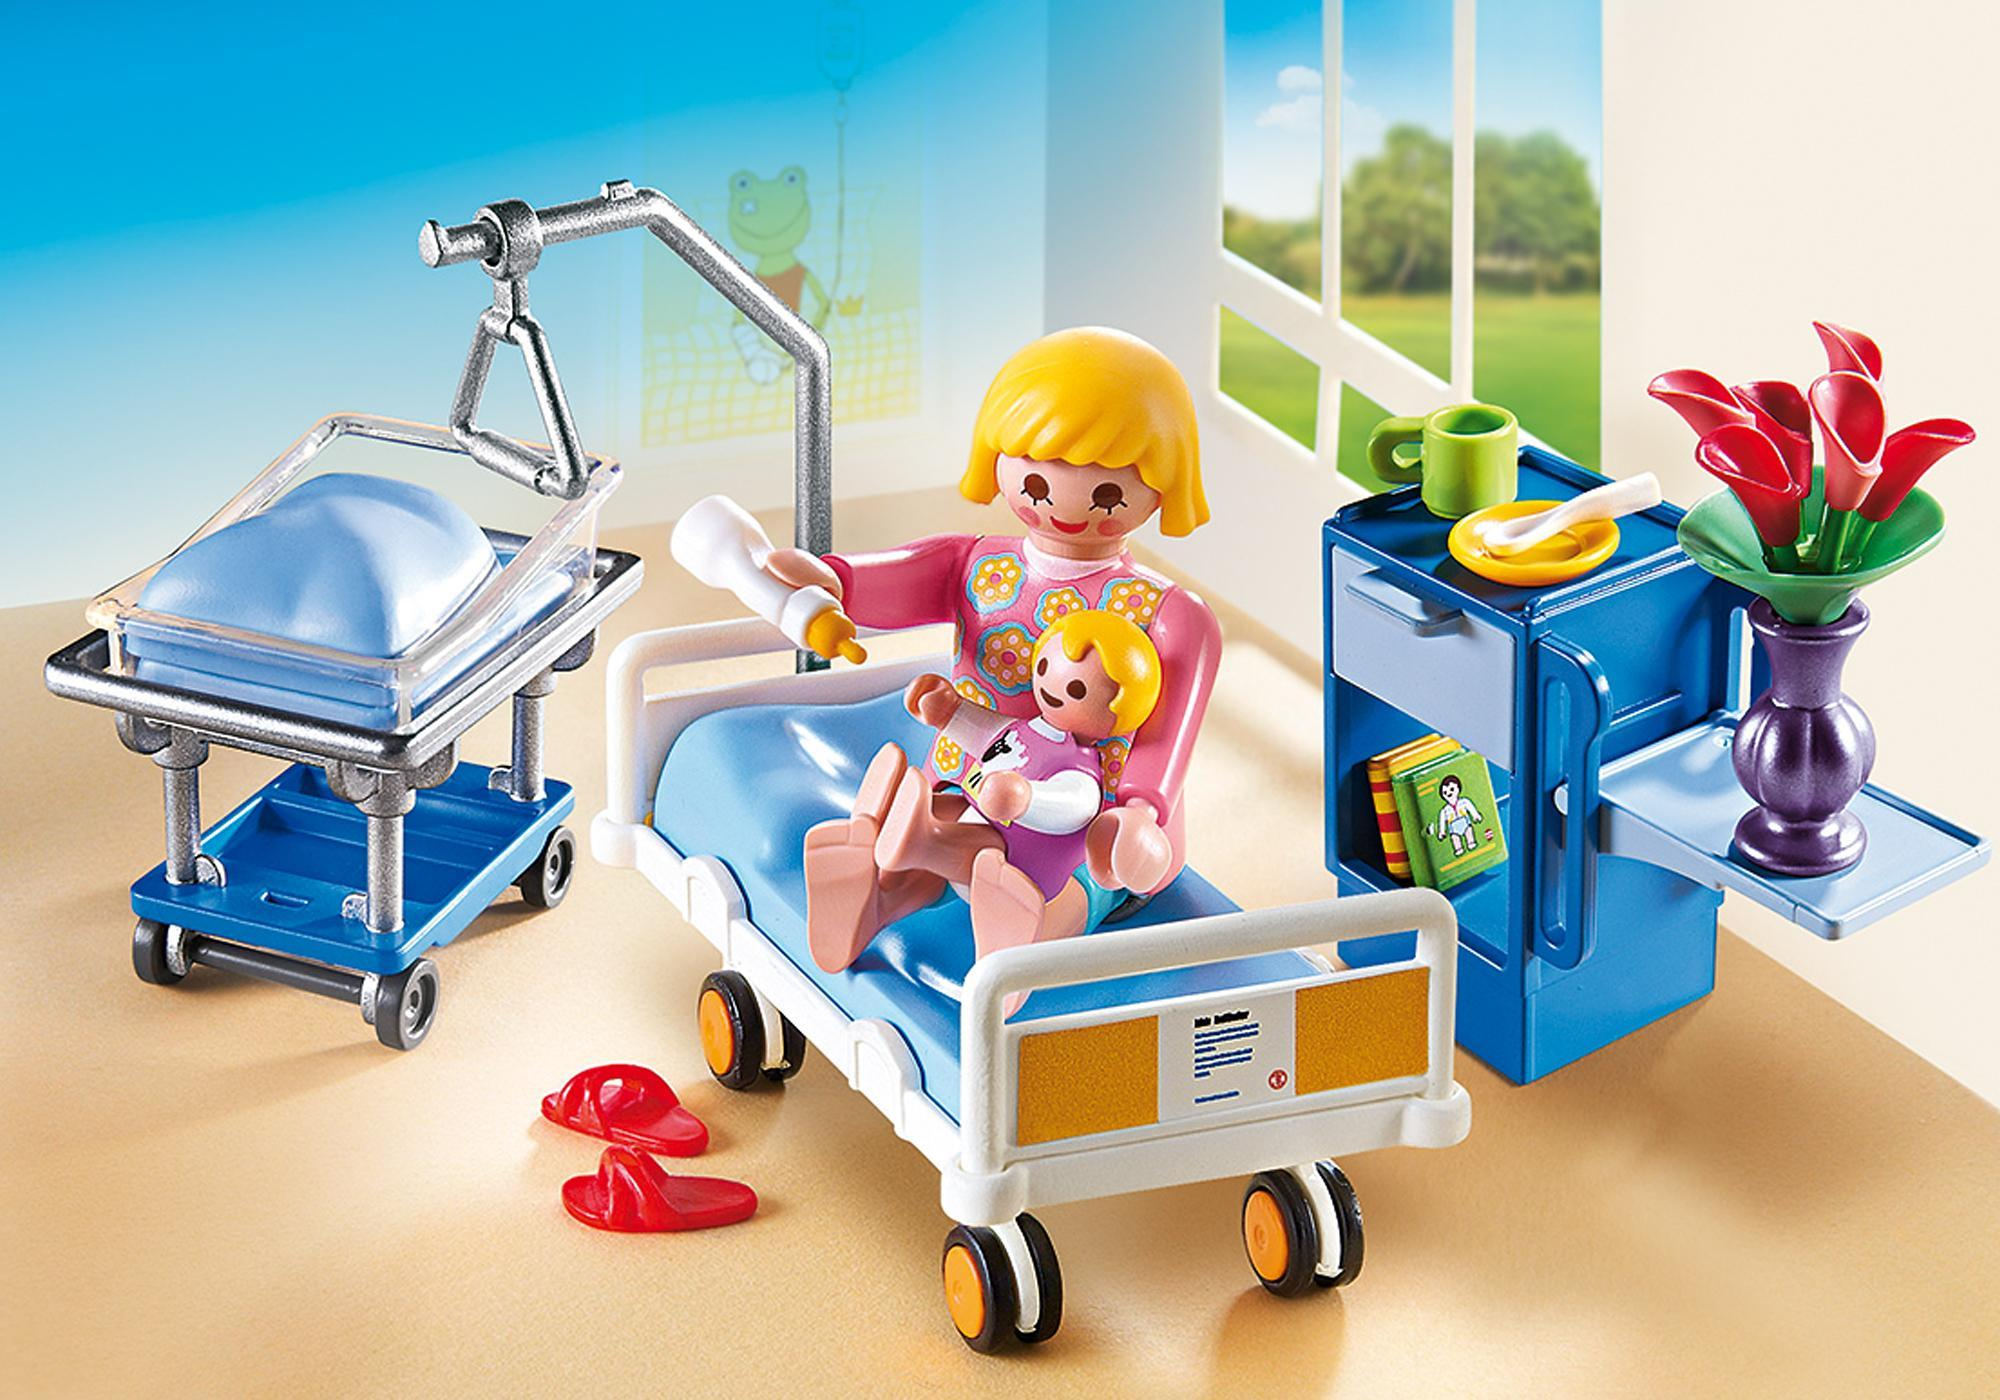 http://media.playmobil.com/i/playmobil/6660_product_detail/Sala de Maternidad